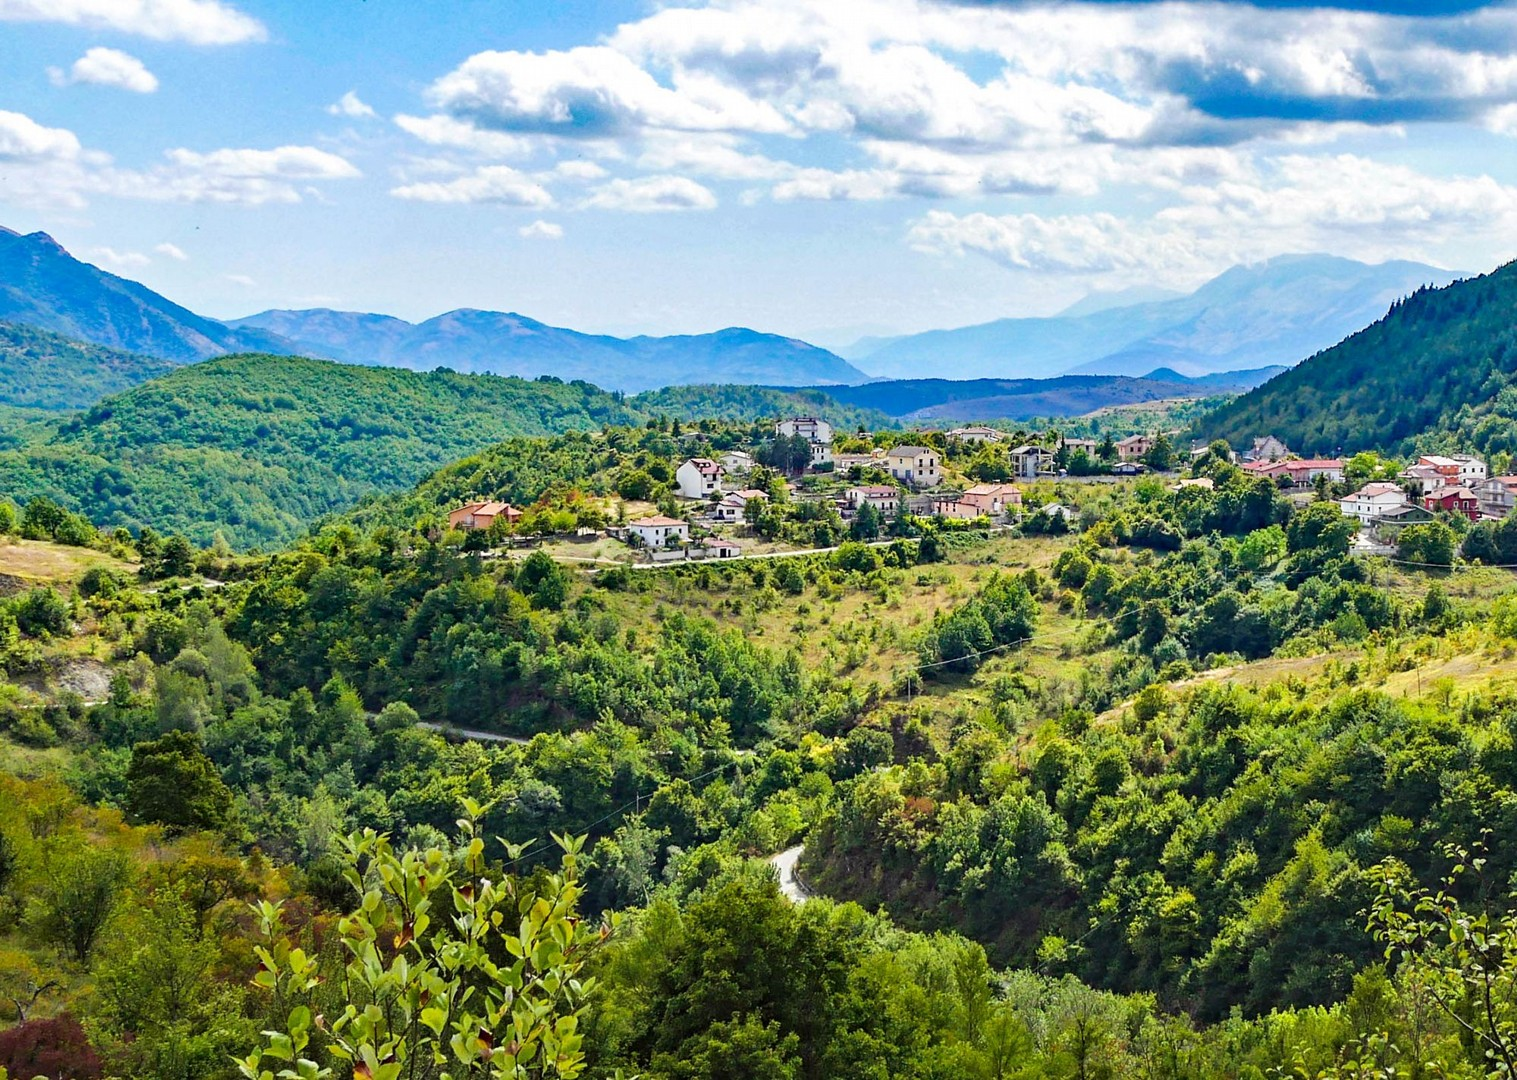 umbria-mountain-village-guided-road-cycling-trip-holiday.jpg - NEW! Italy - Coast to Coast - L'Adriatico al Tirreno - Road Cycling